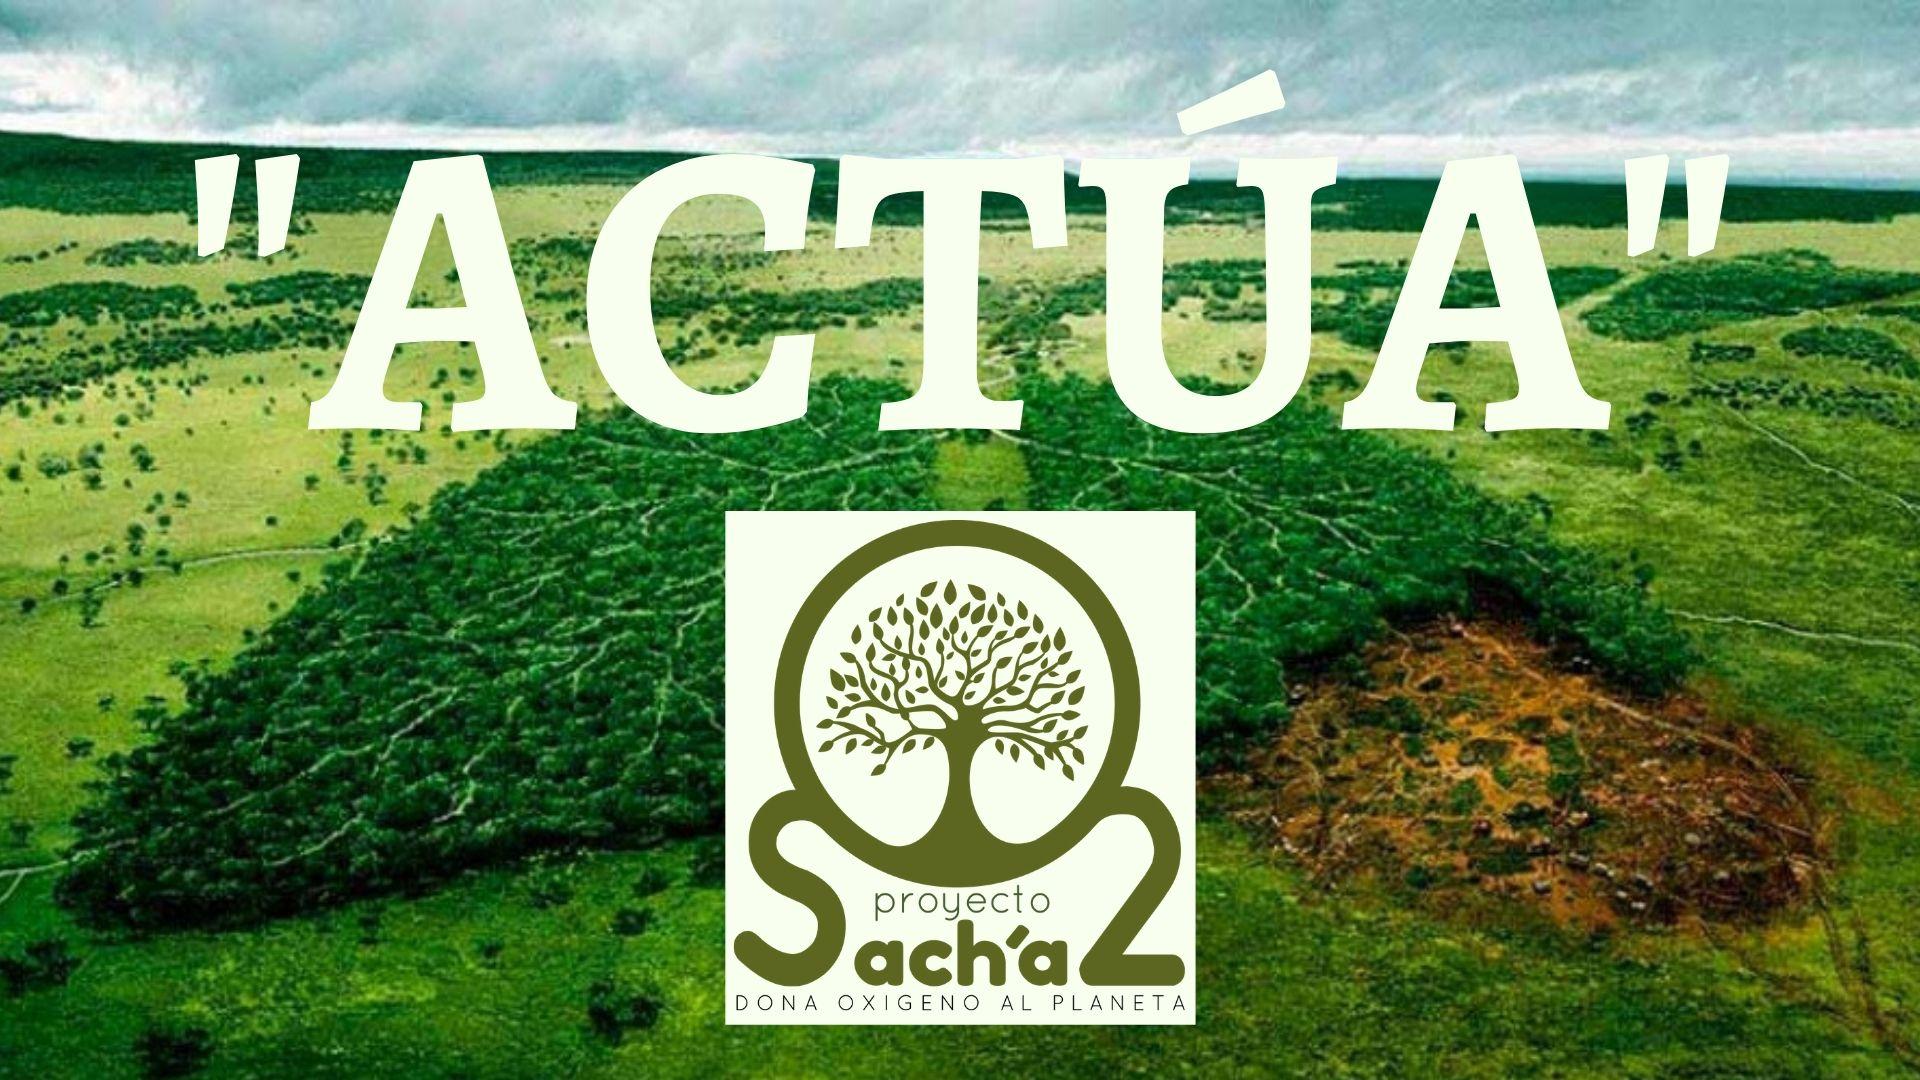 Proyecto Sacha, dona oxigeno al planeta